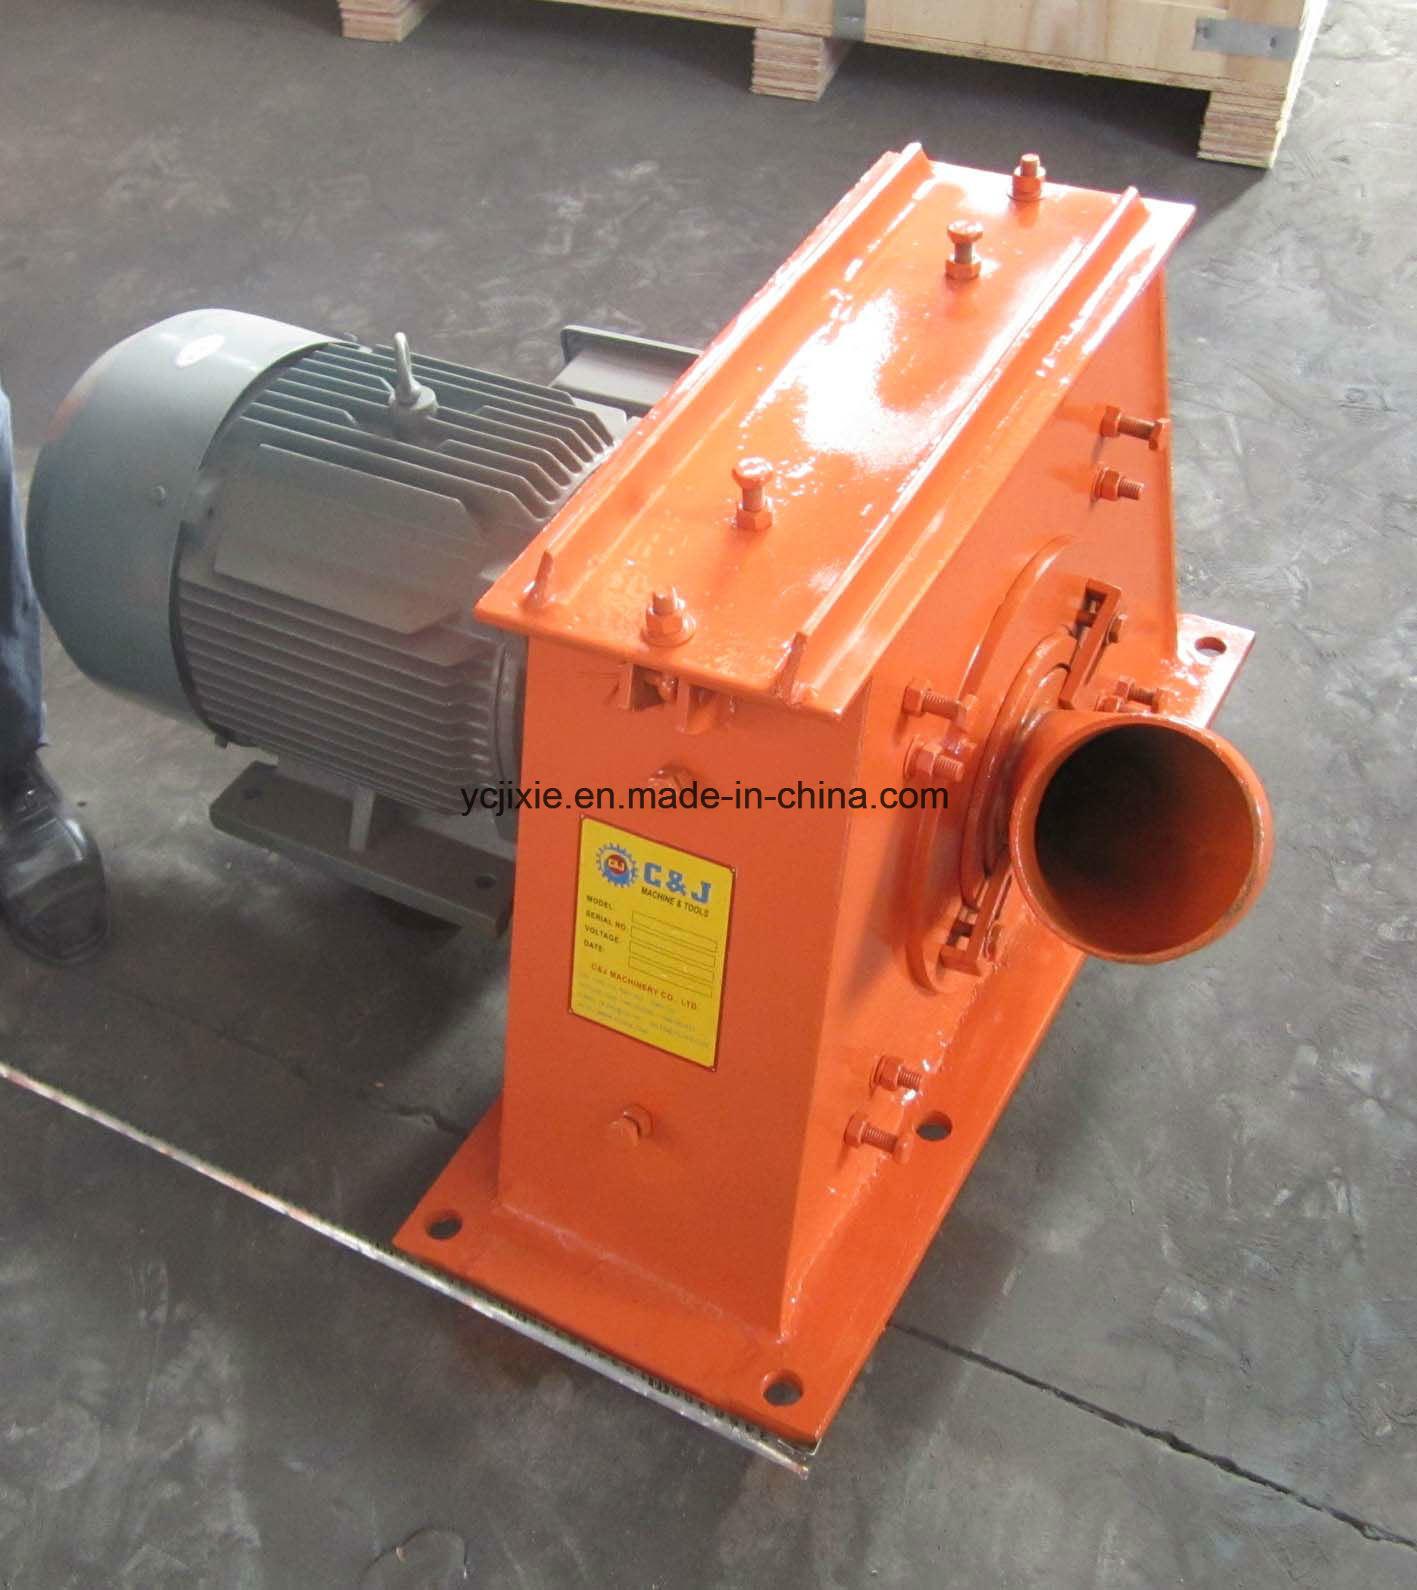 Impeller Unit / Blasting Wheel Turbines/ Shot Blaster/Shot Peening / Wheel Abrator